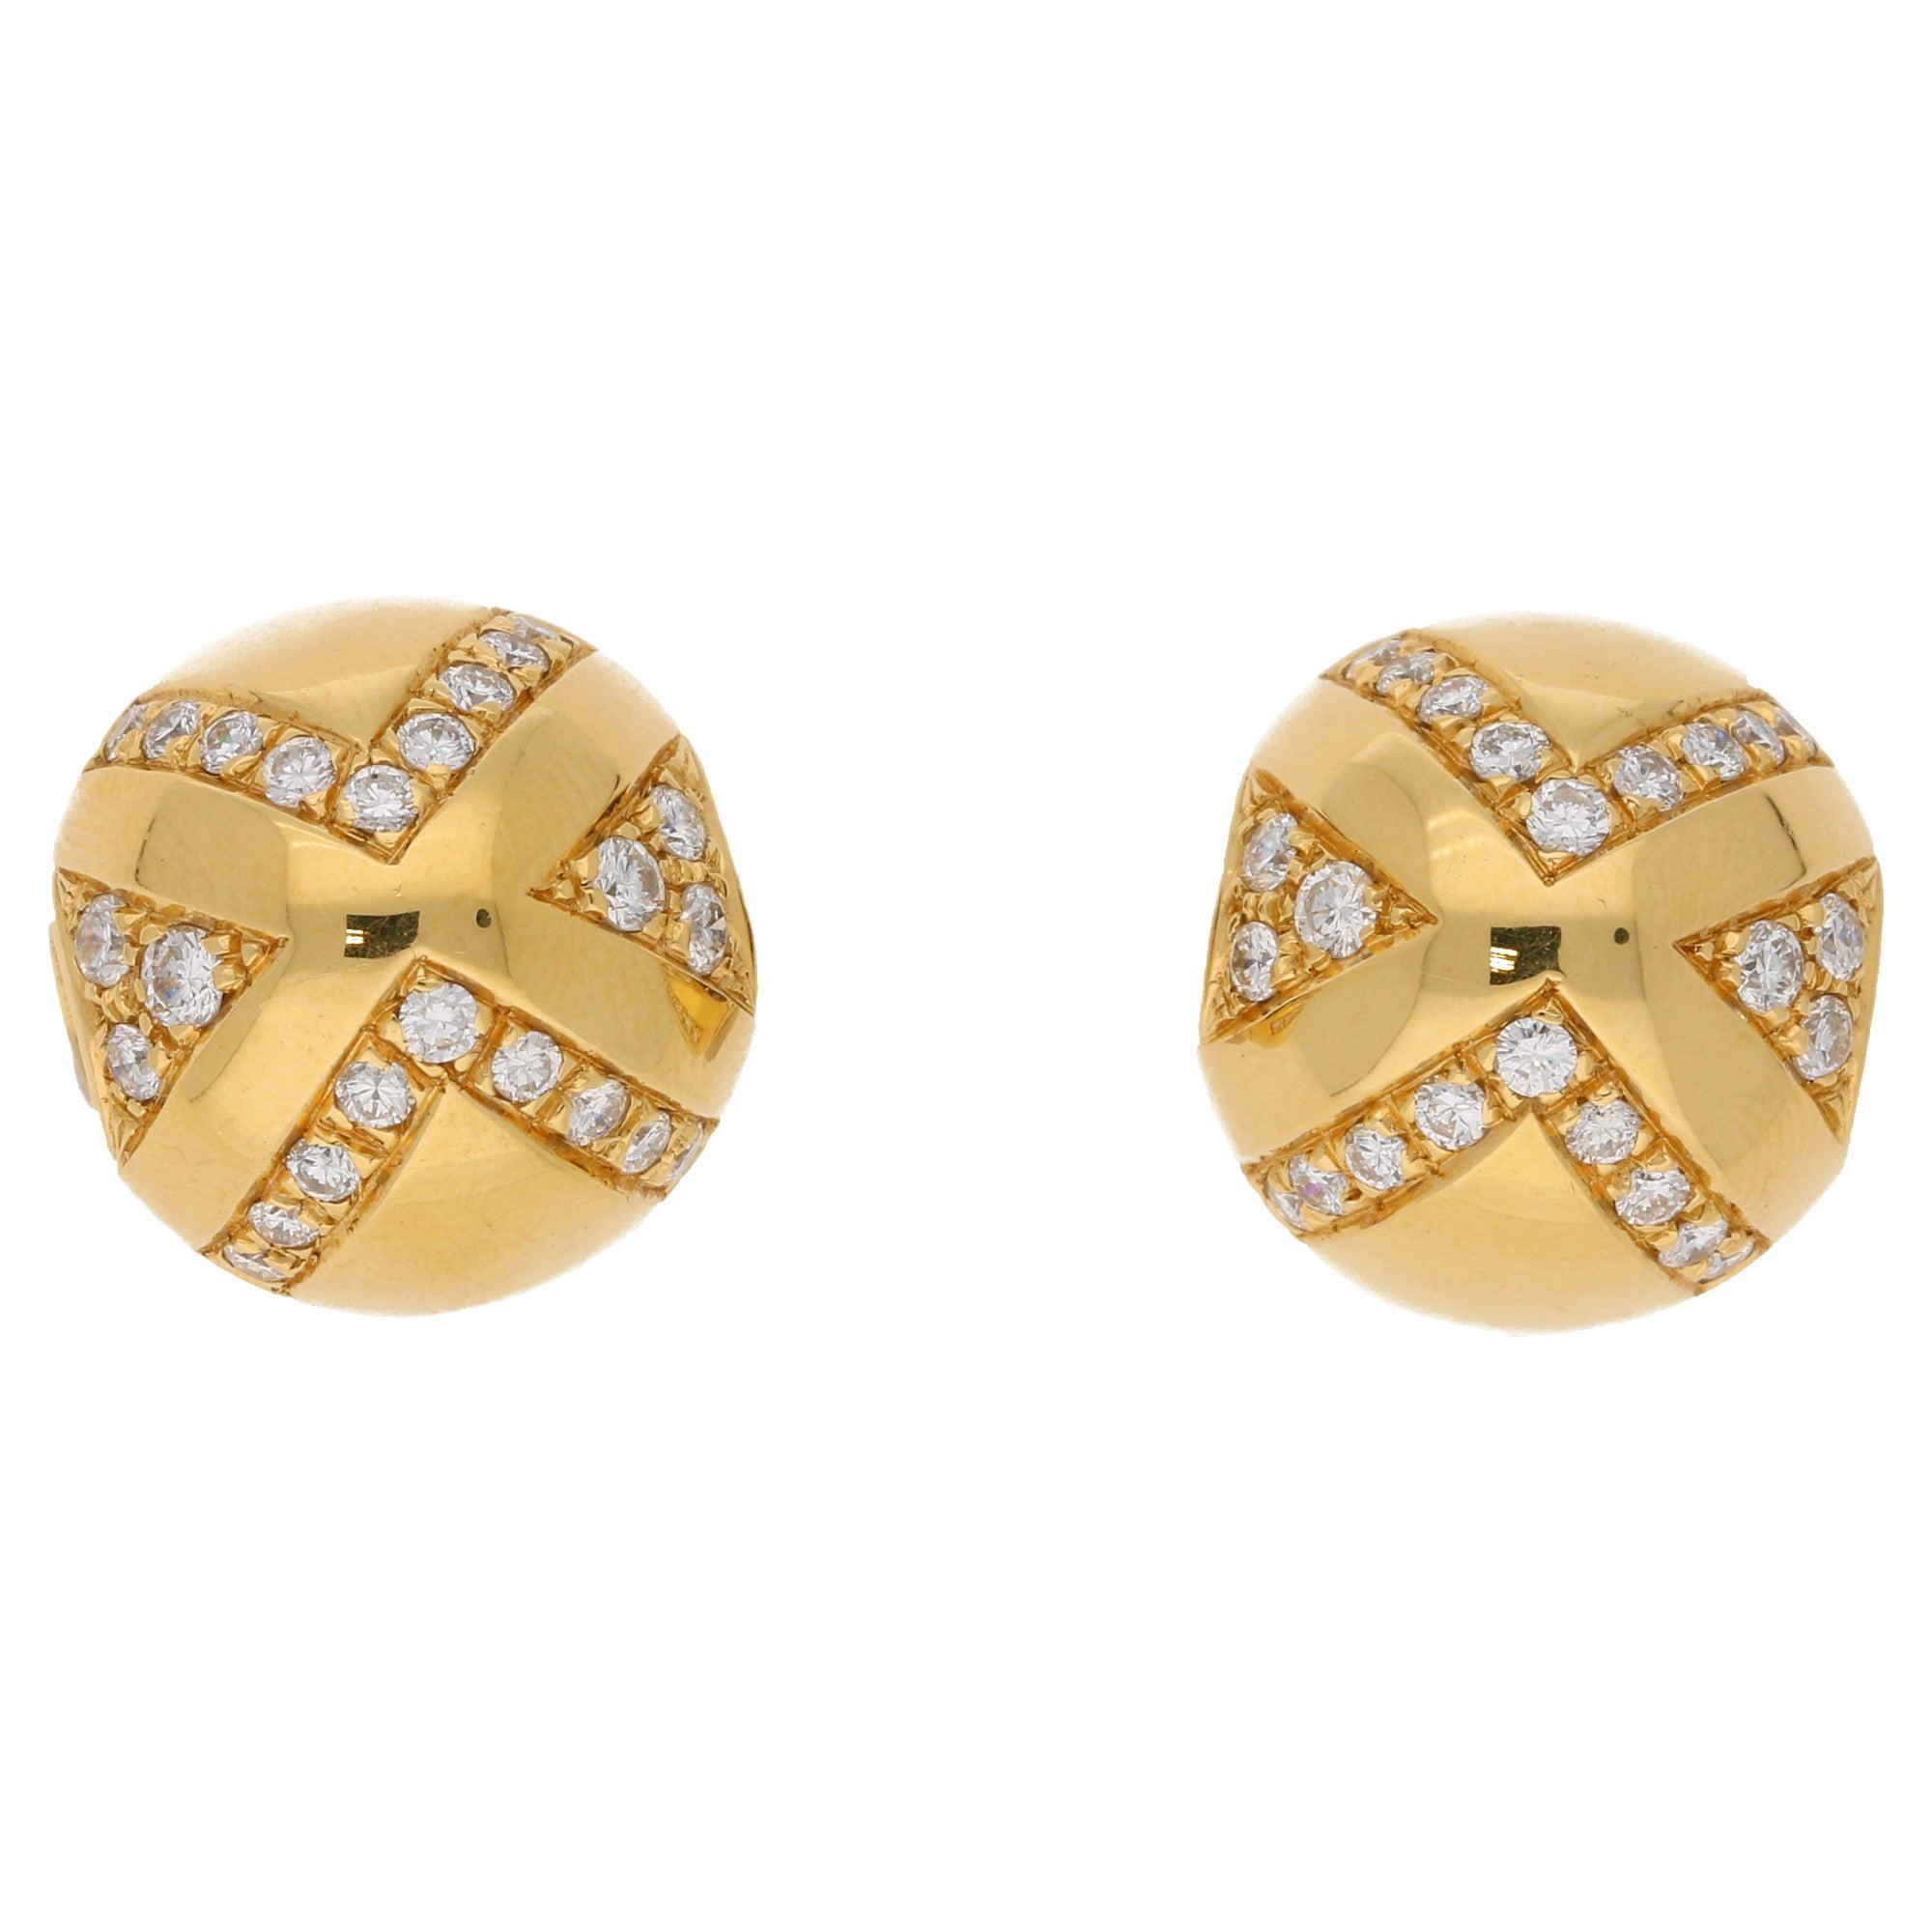 Bvlgari Diamond Ball Clip On Earring Set in Yellow Gold